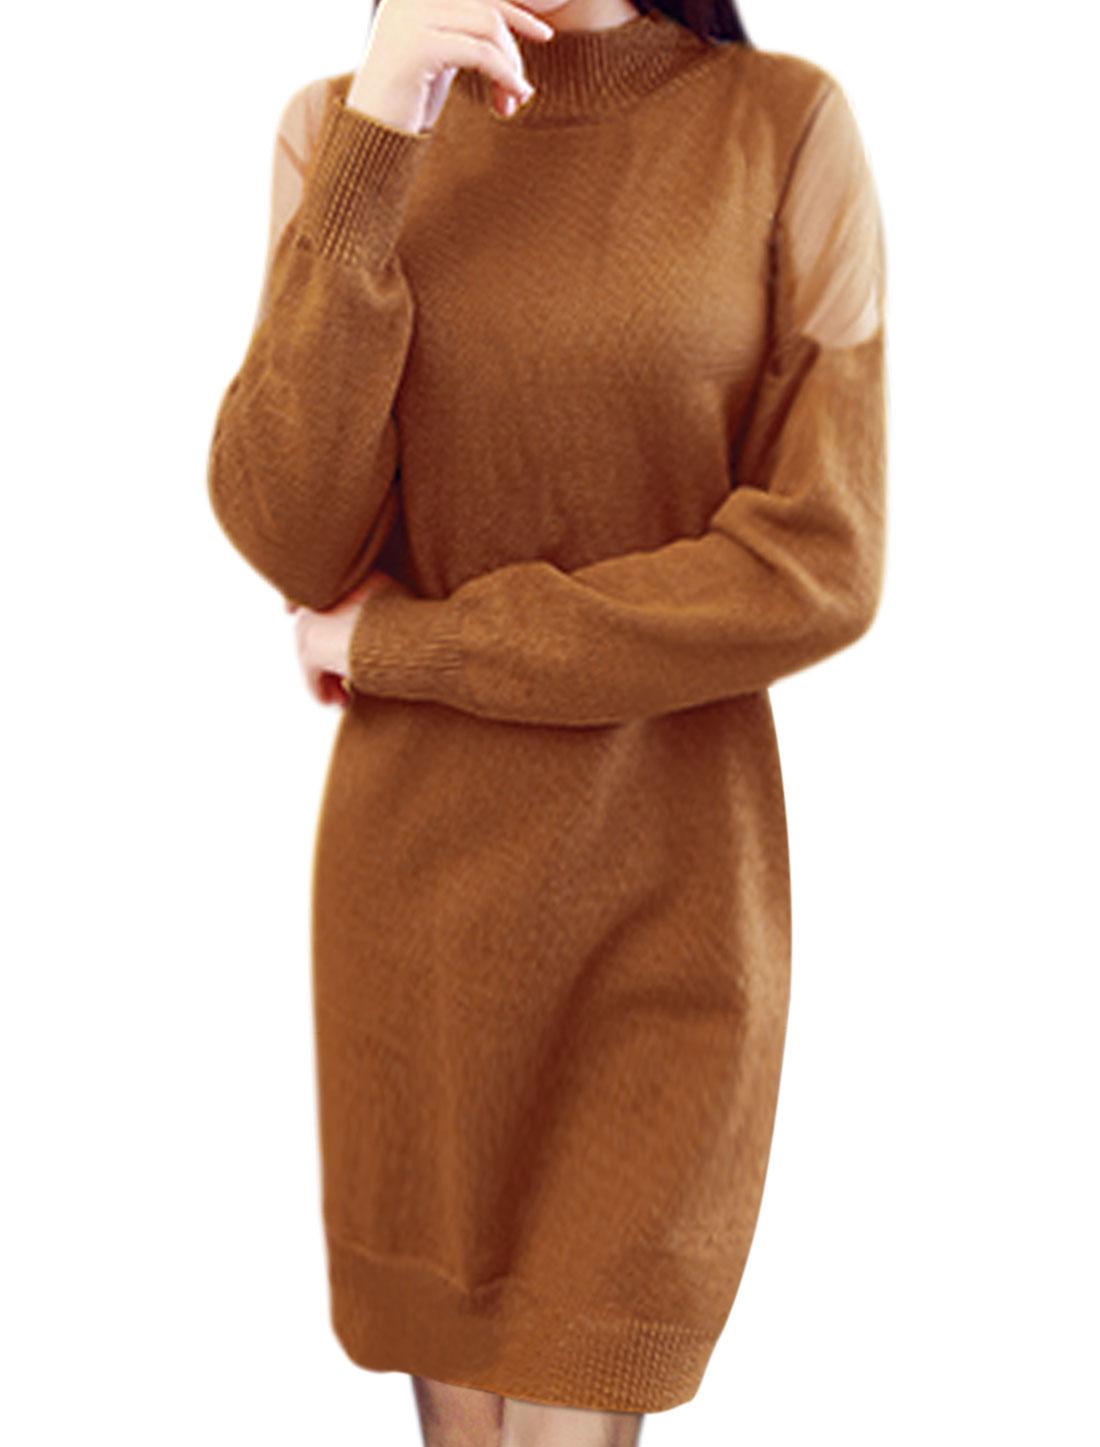 Ladies Mock Neck Mesh Panel Knitted Sheath Dress Brown XS